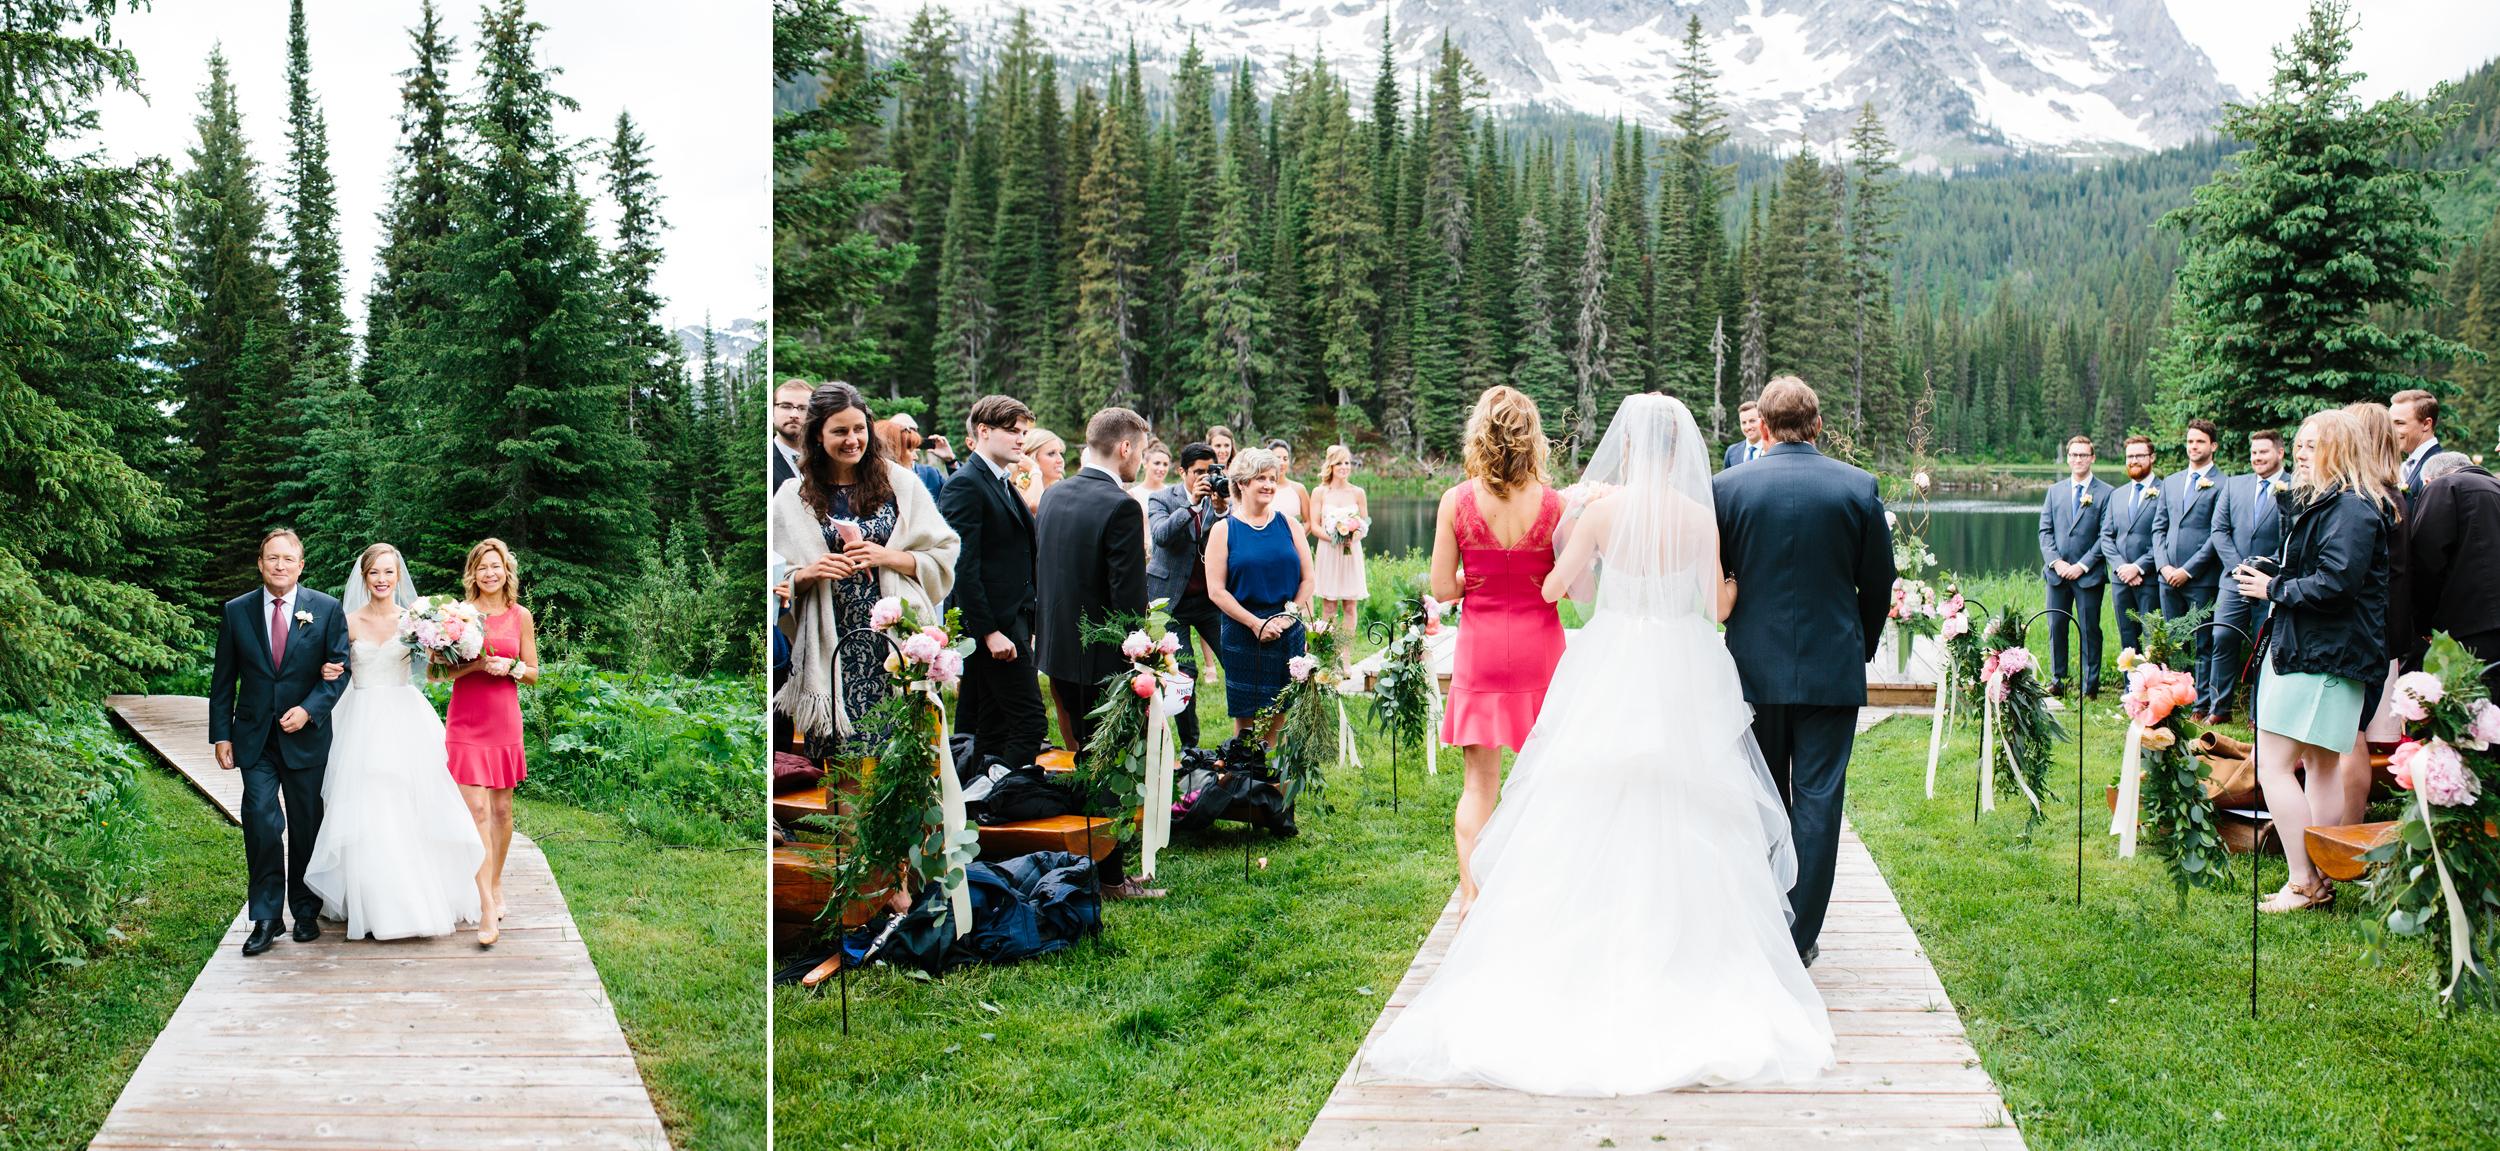 Island_Lake_Lodge_Wedding0022.jpg